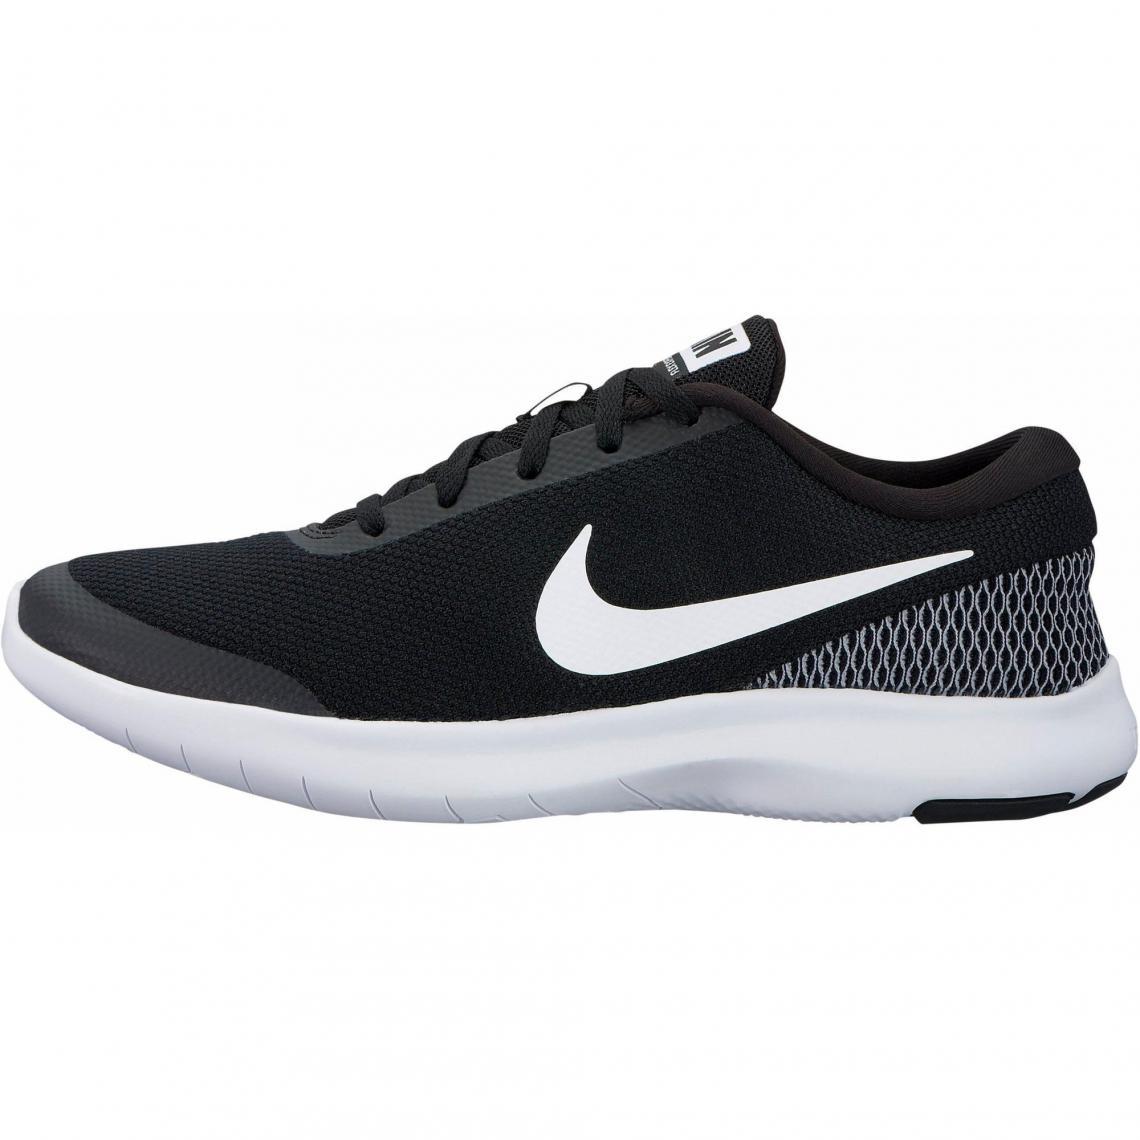 info for fd1e7 9fc1c Baskets femme Wmns Flex Experience Run 7 Nike - Noir - Blanc Nike Femme